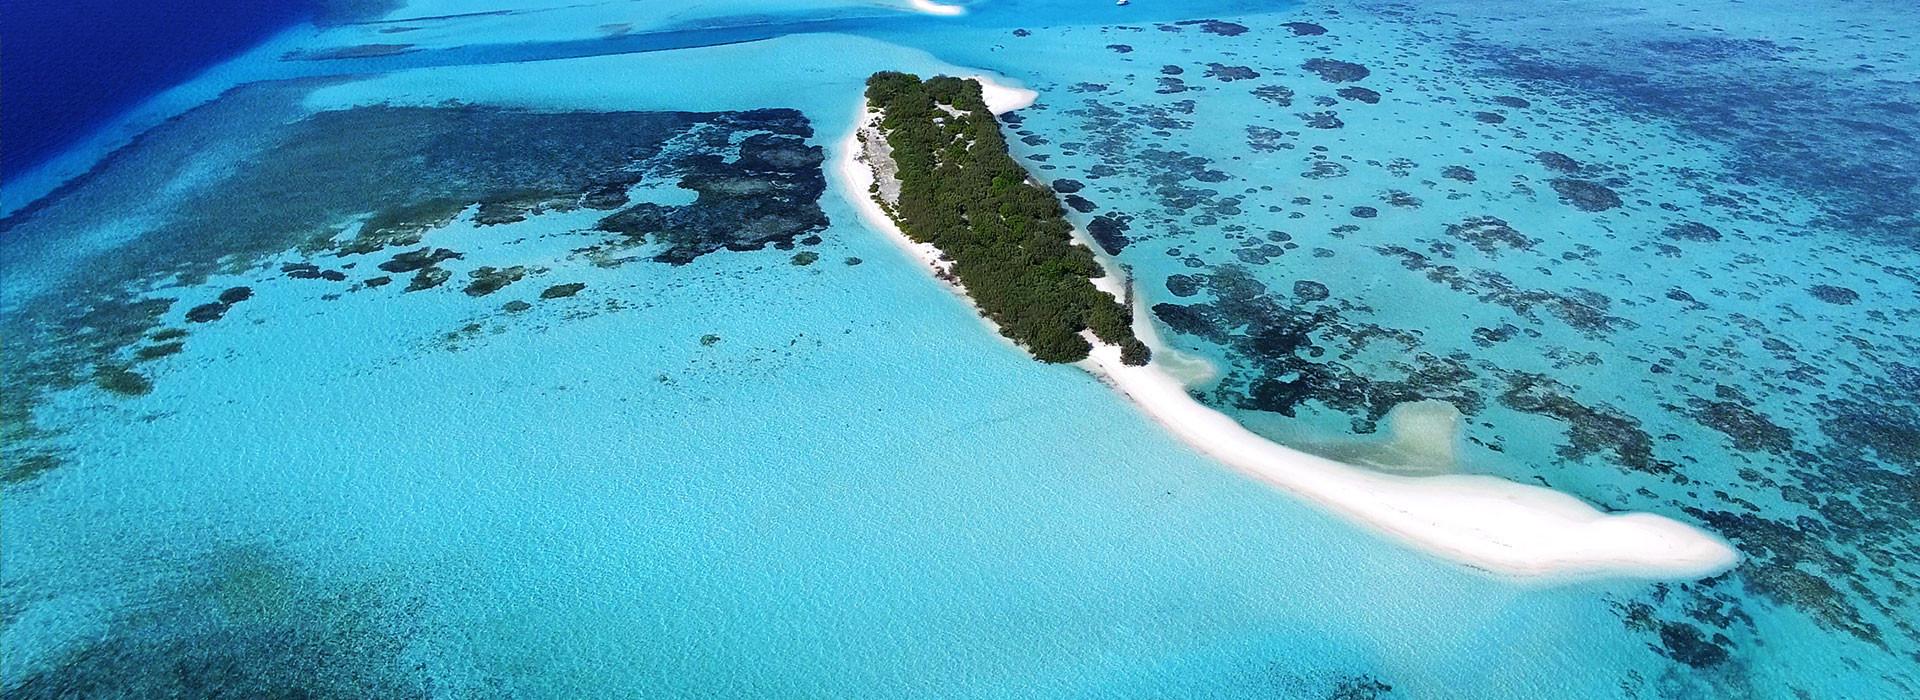 APRIL 2018: CATAMARAN CRUISE MALDIVES